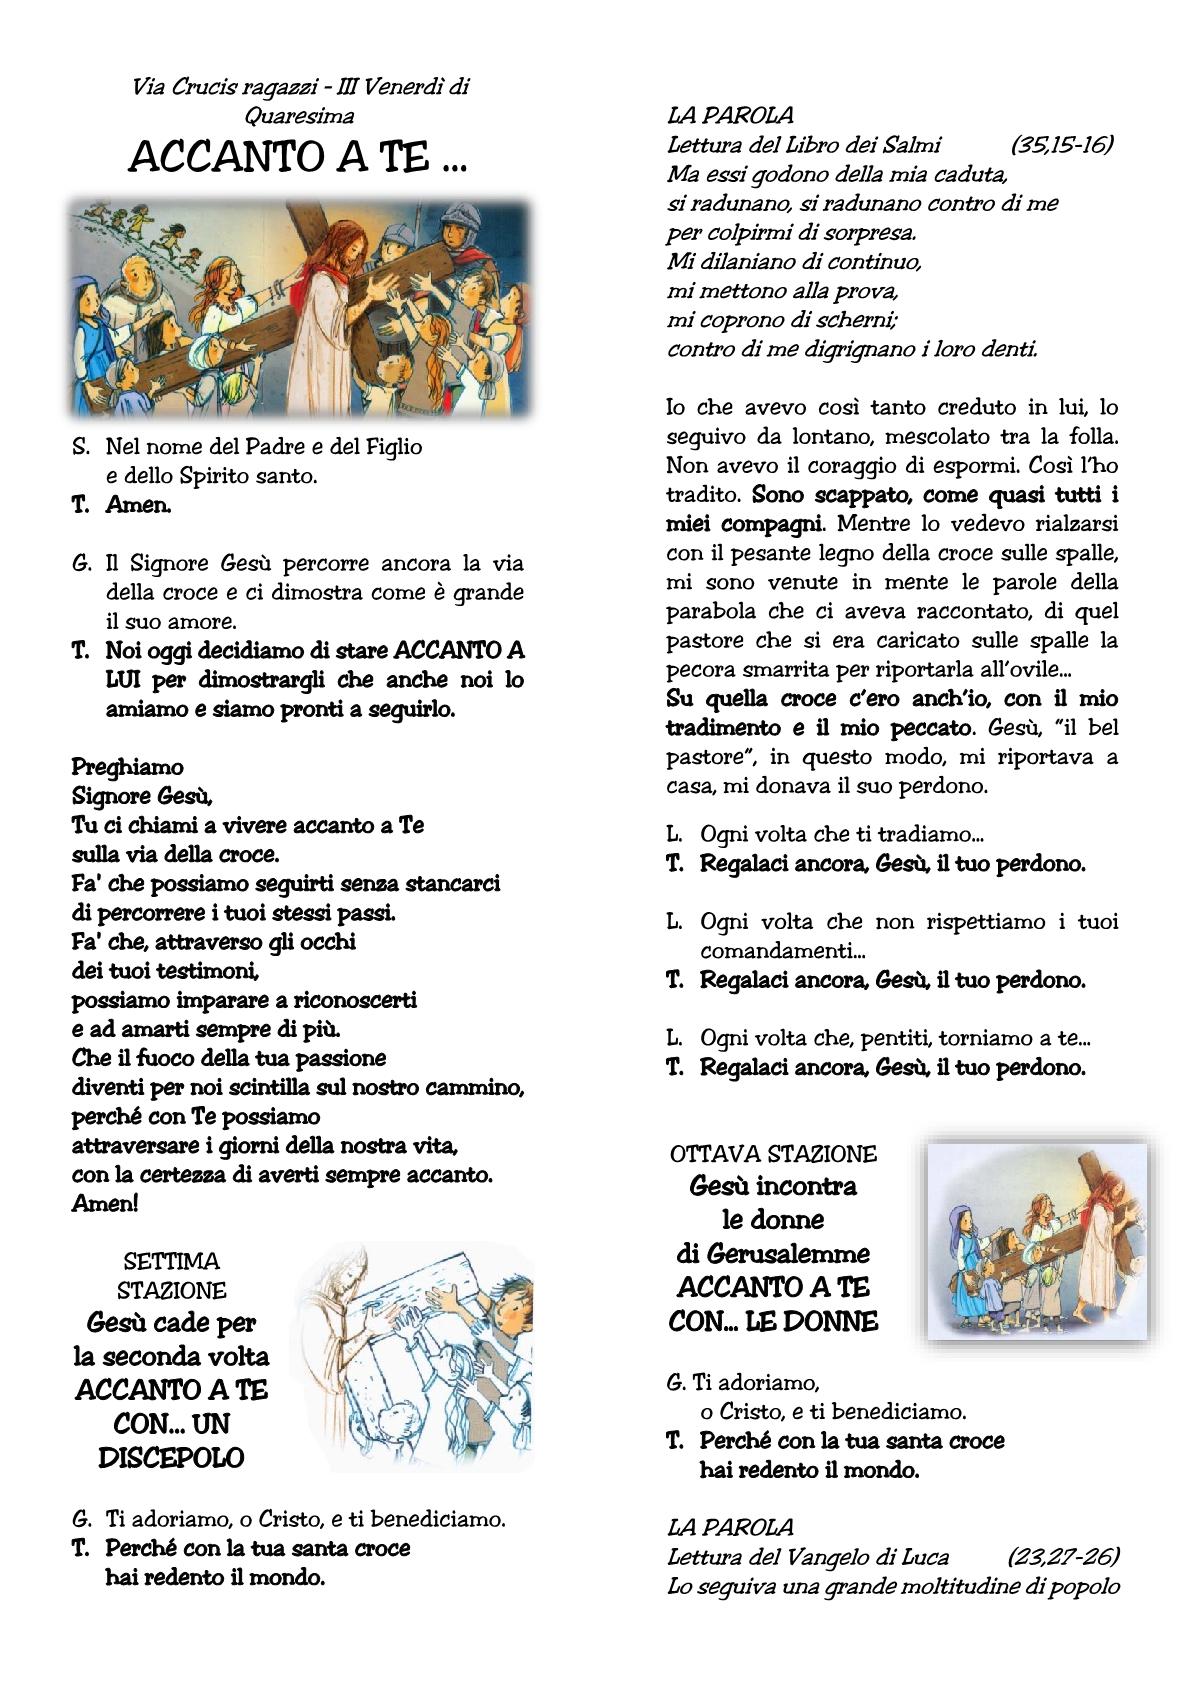 Via Crucis raga III venerdì1